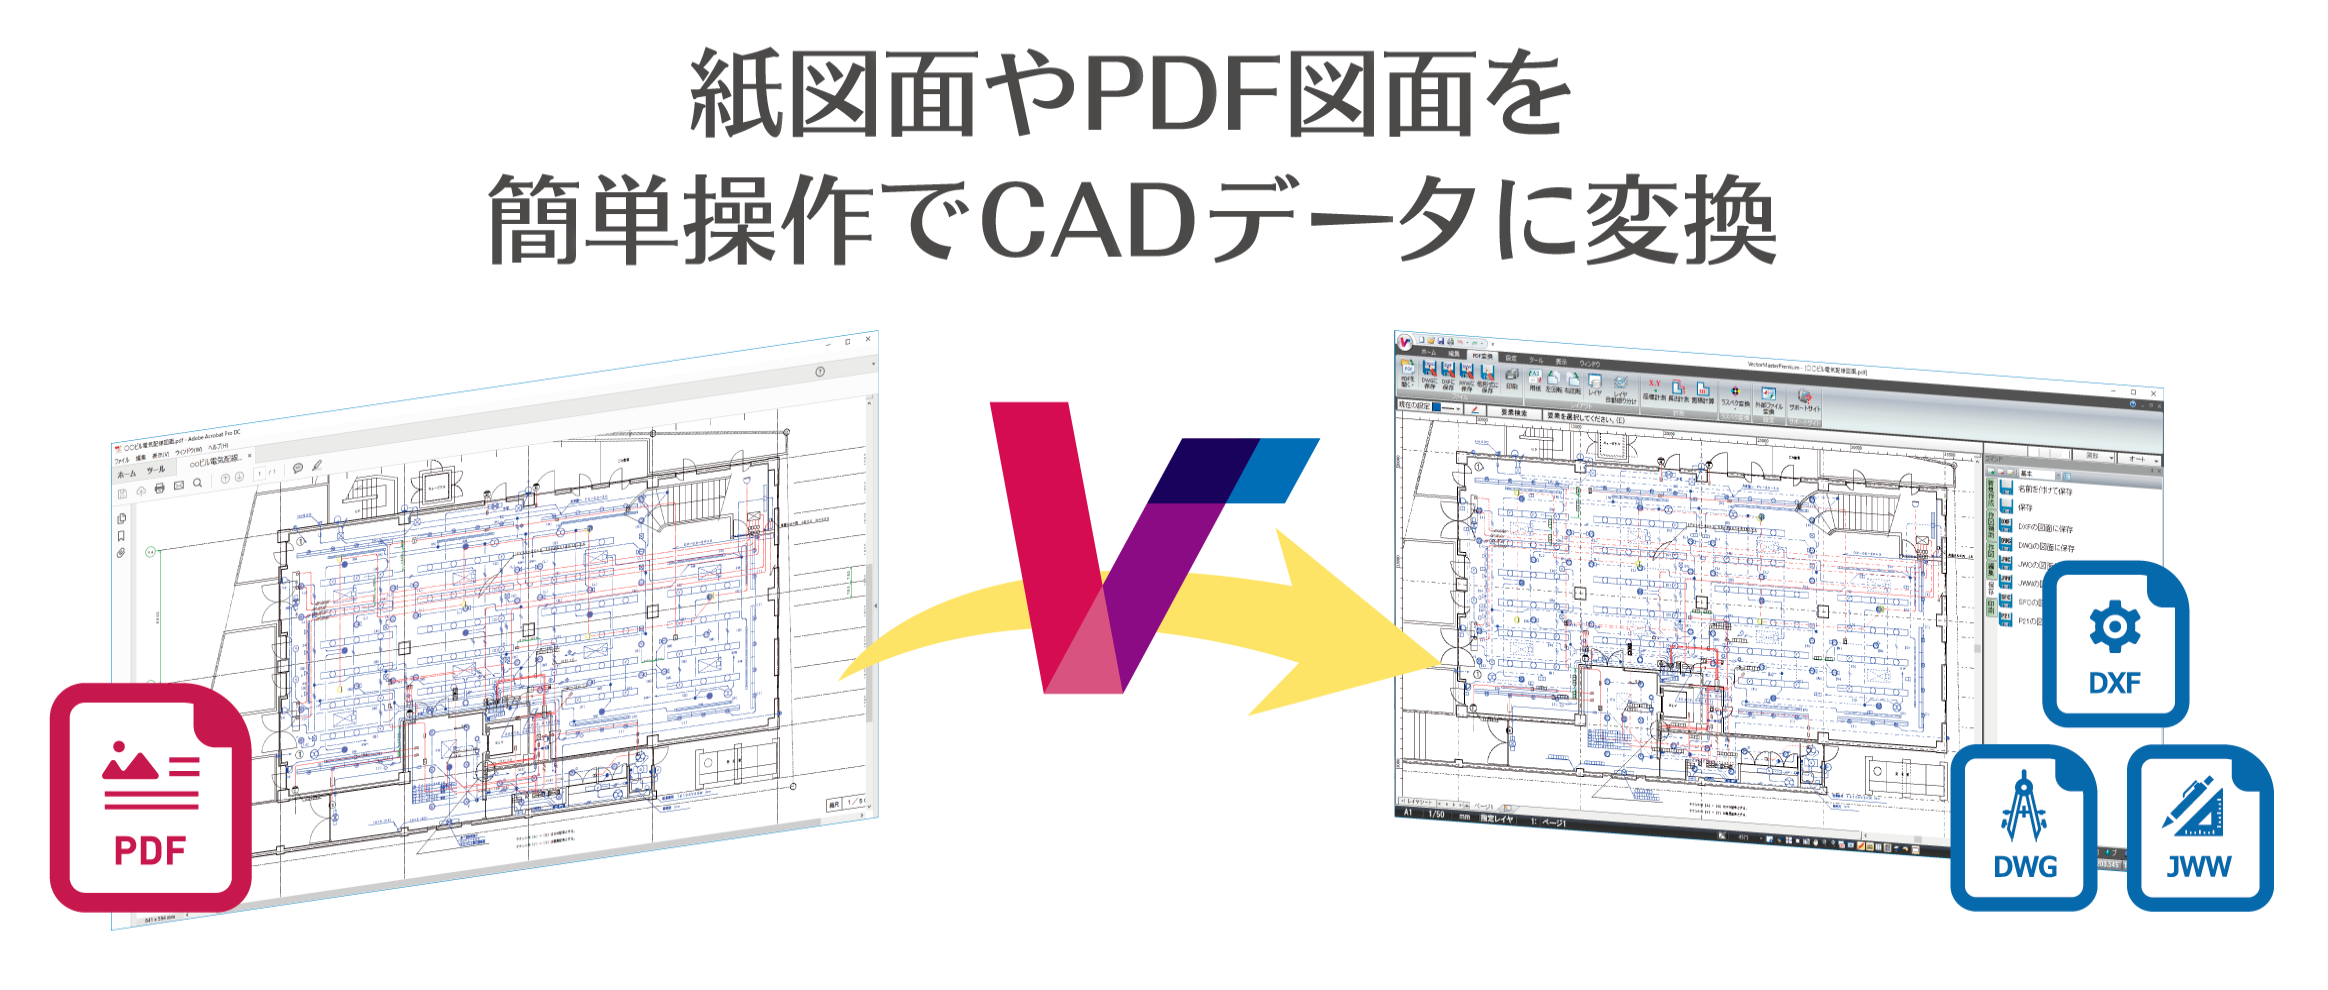 pdf データ 編集無料ソフト